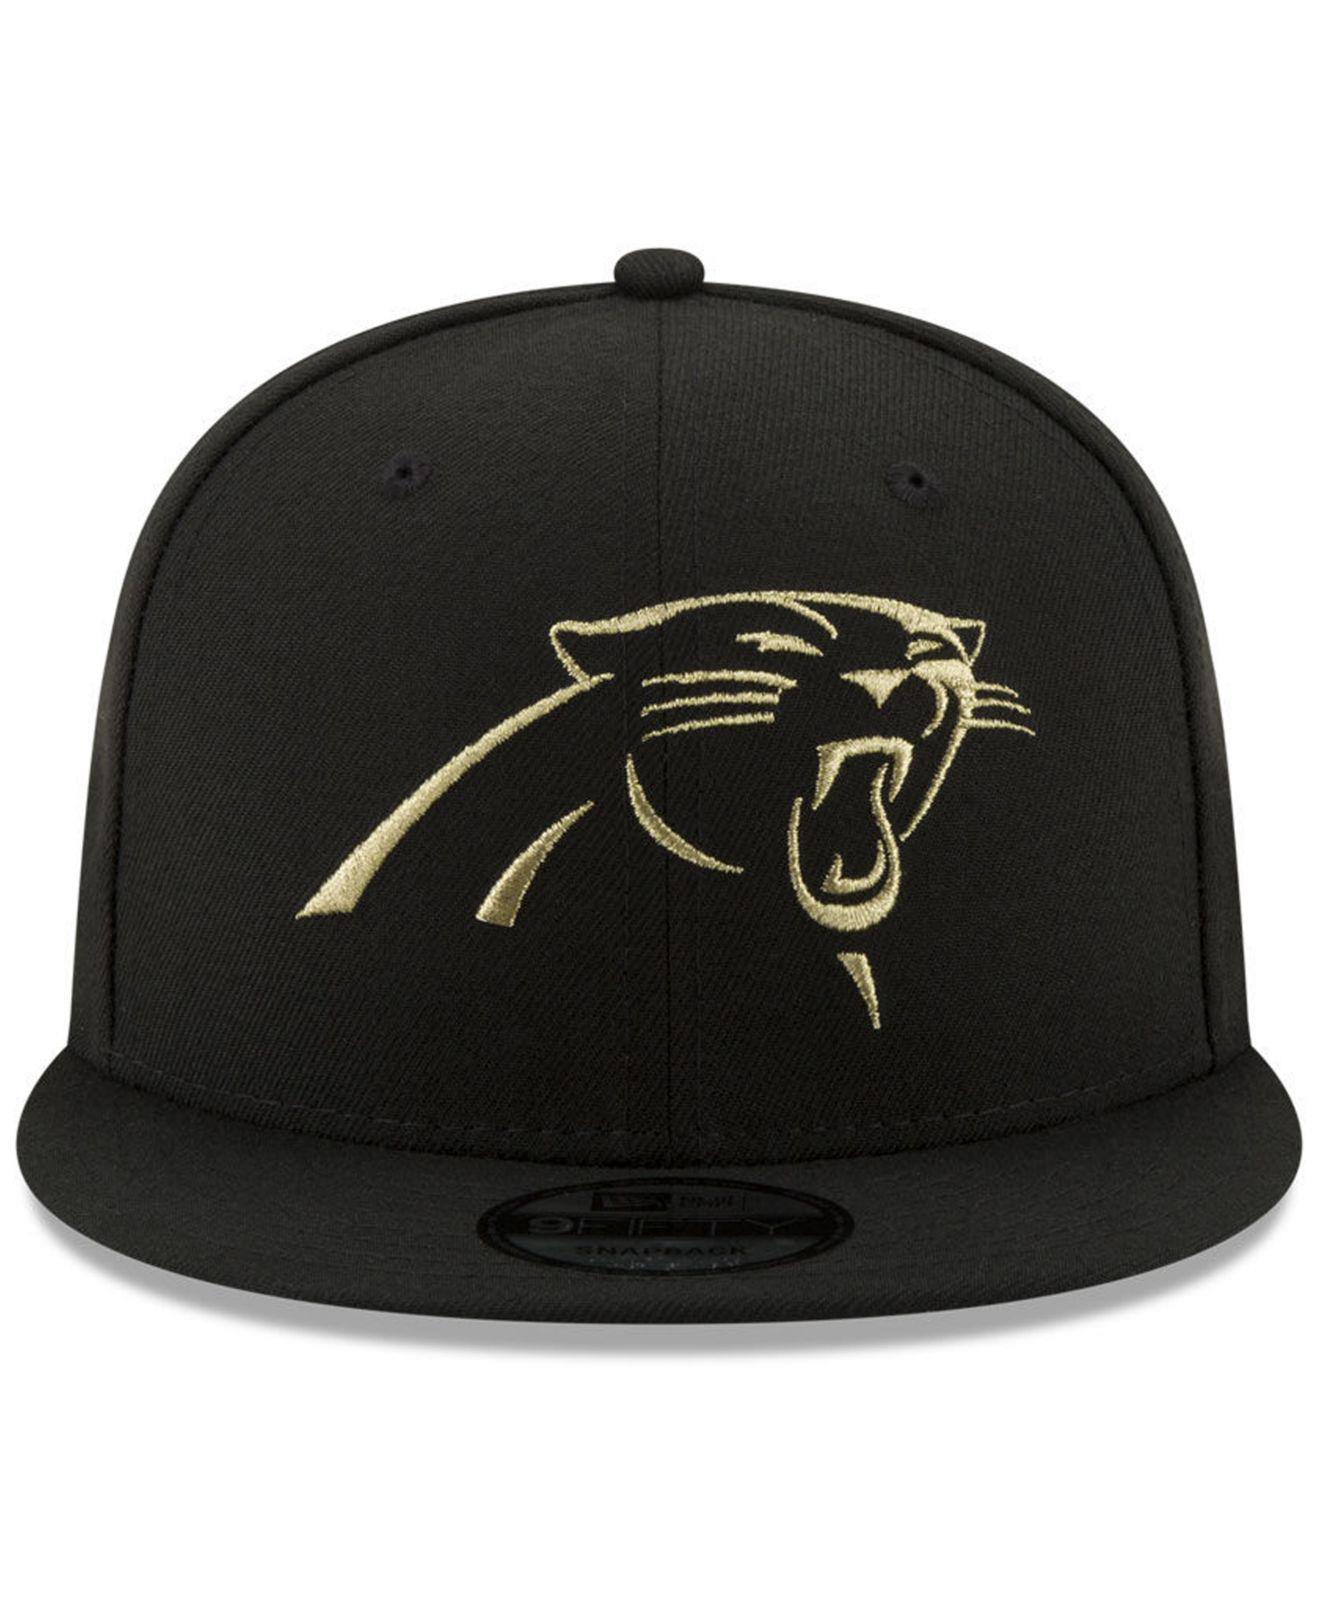 6fbab3dbf best black and gold carolina panthers hat e60f2 b4cf9